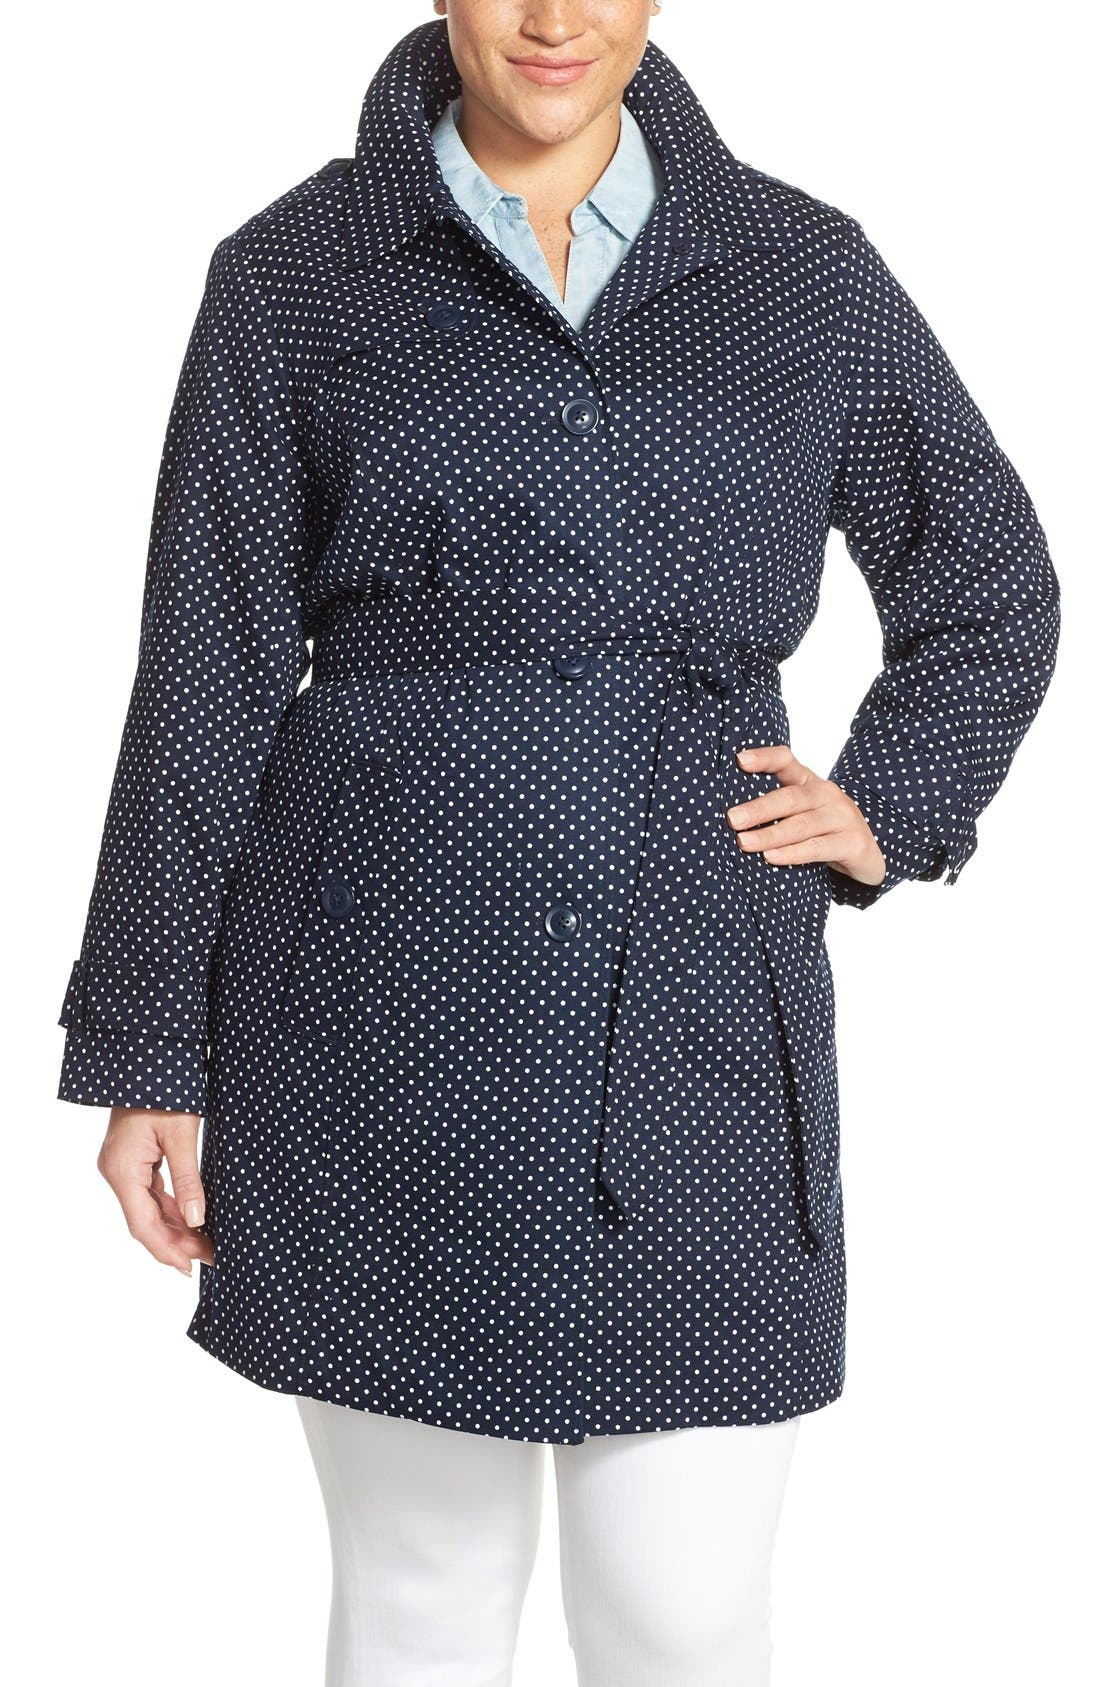 Alternate Image 1 Selected - London Fog Polka Dot Single Breasted Trench Coat (Plus Size)